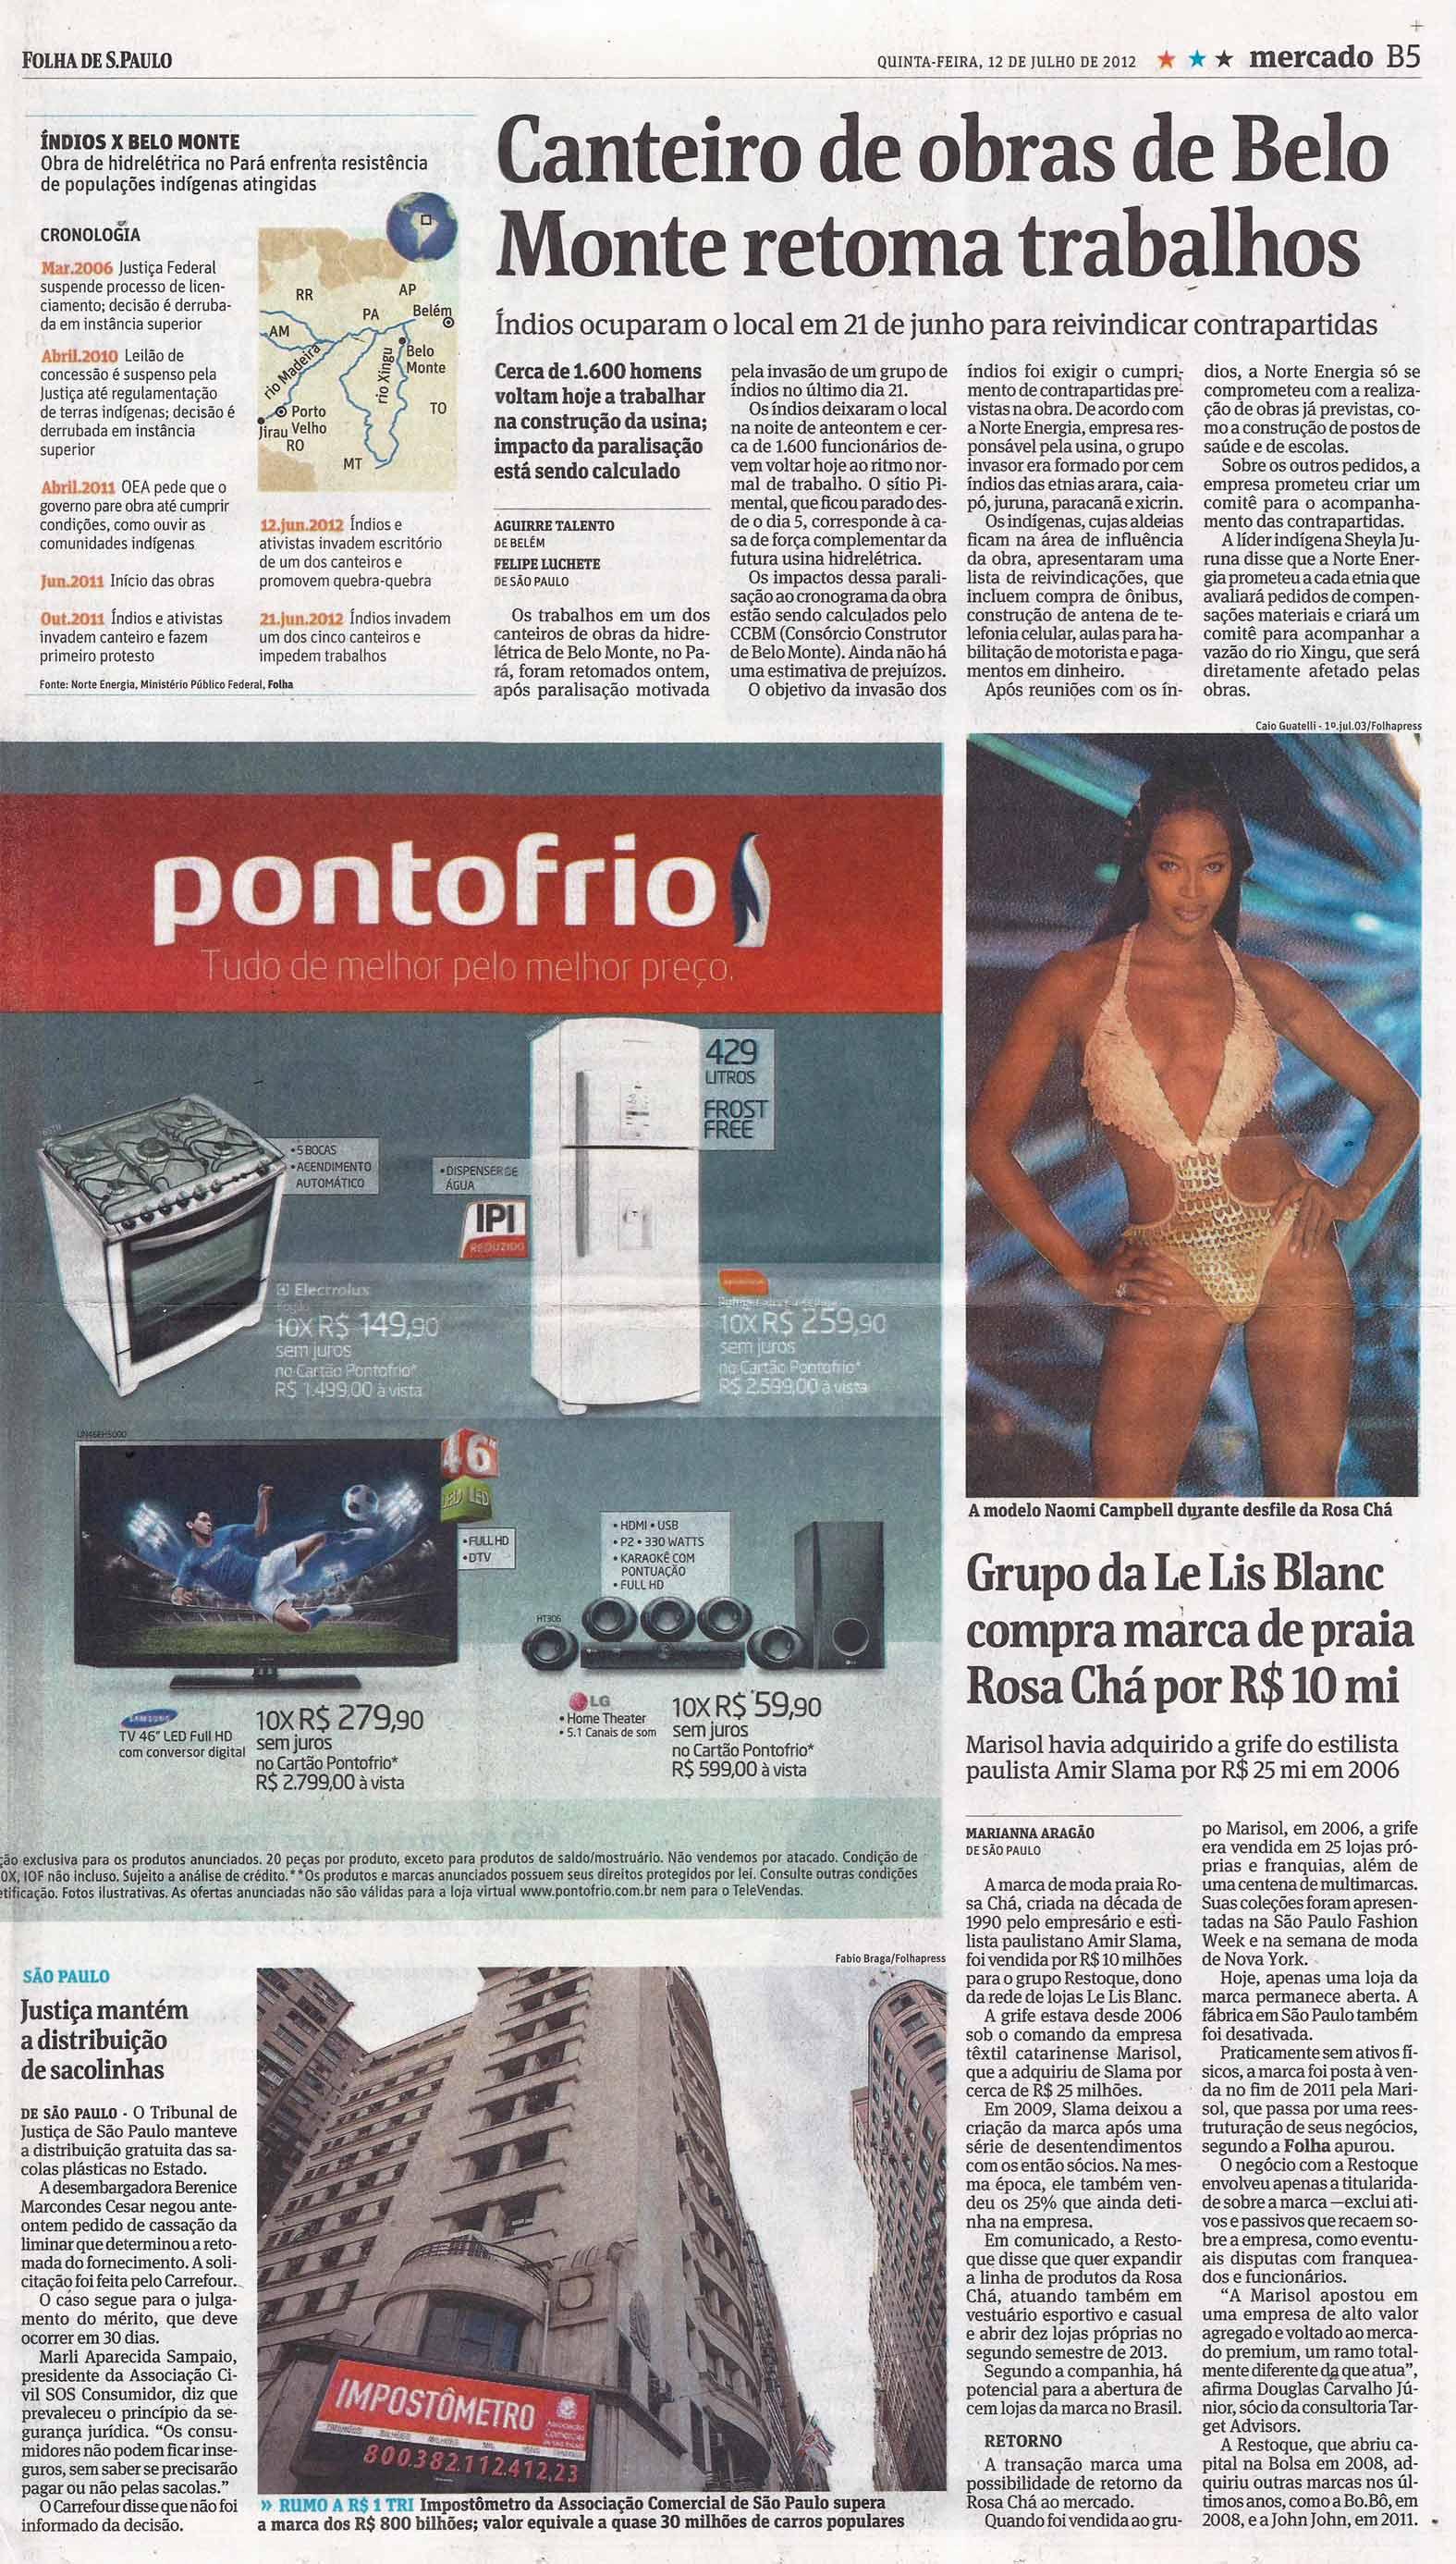 folha-de-sao-paulo-12-07-2012-target-advisor-2